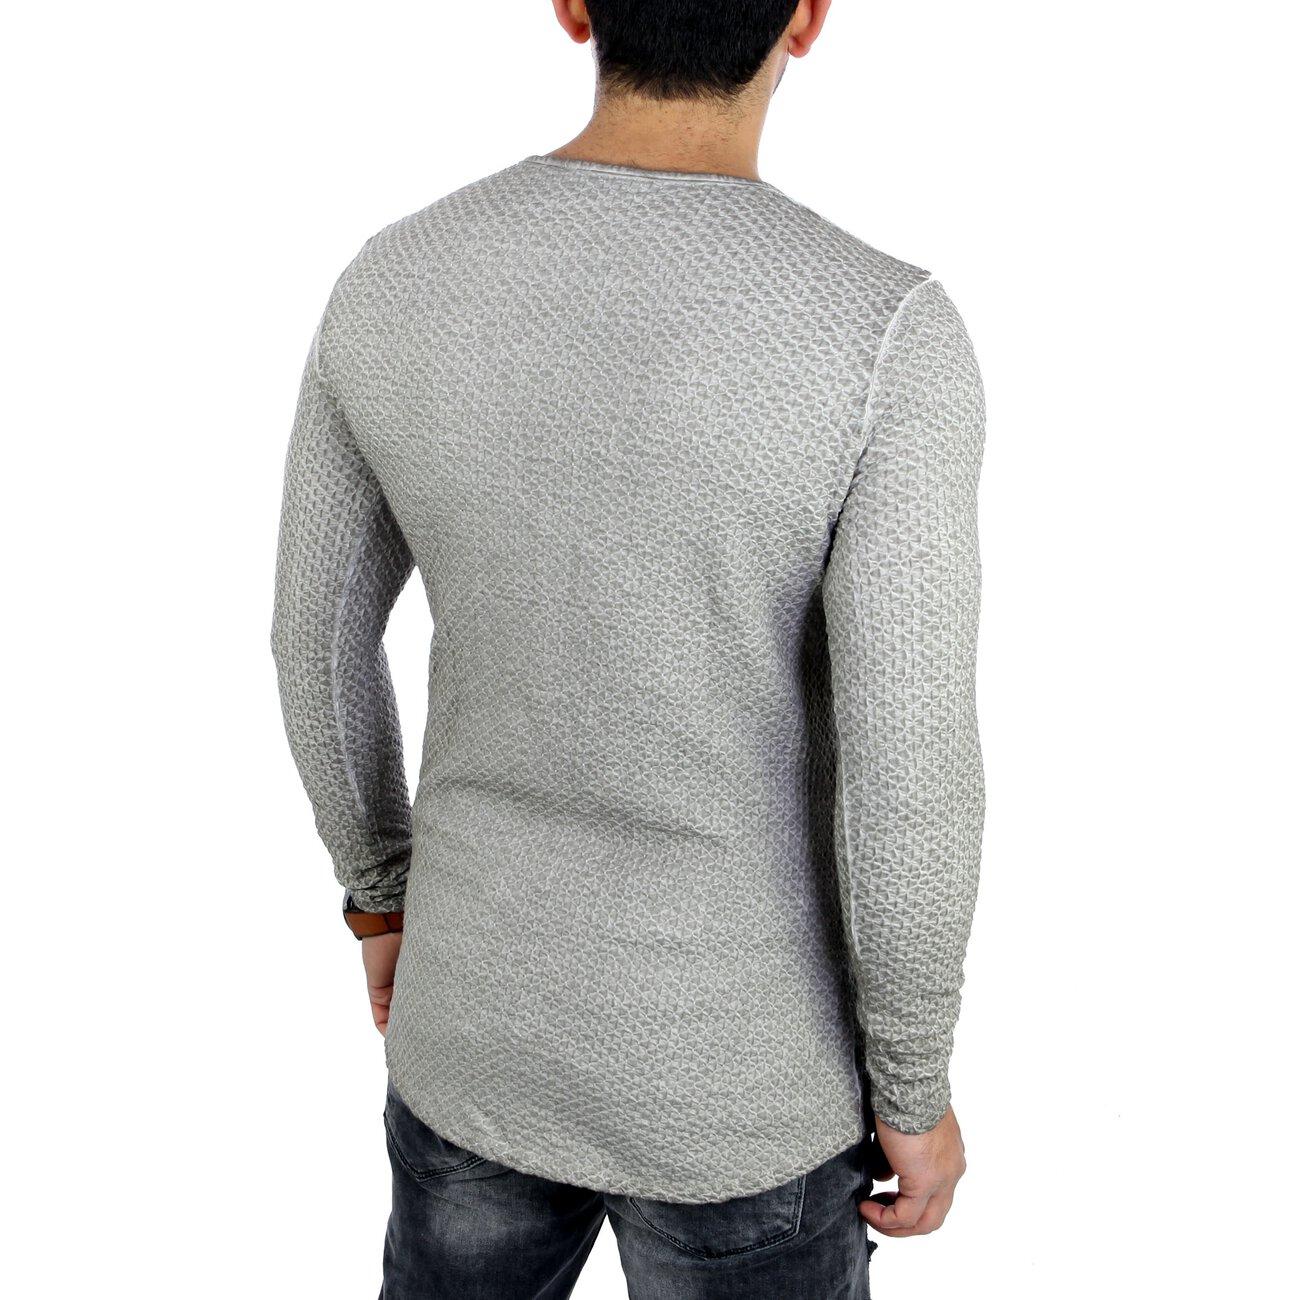 reslad longsleeve herren rundhals langarmshirt mit. Black Bedroom Furniture Sets. Home Design Ideas